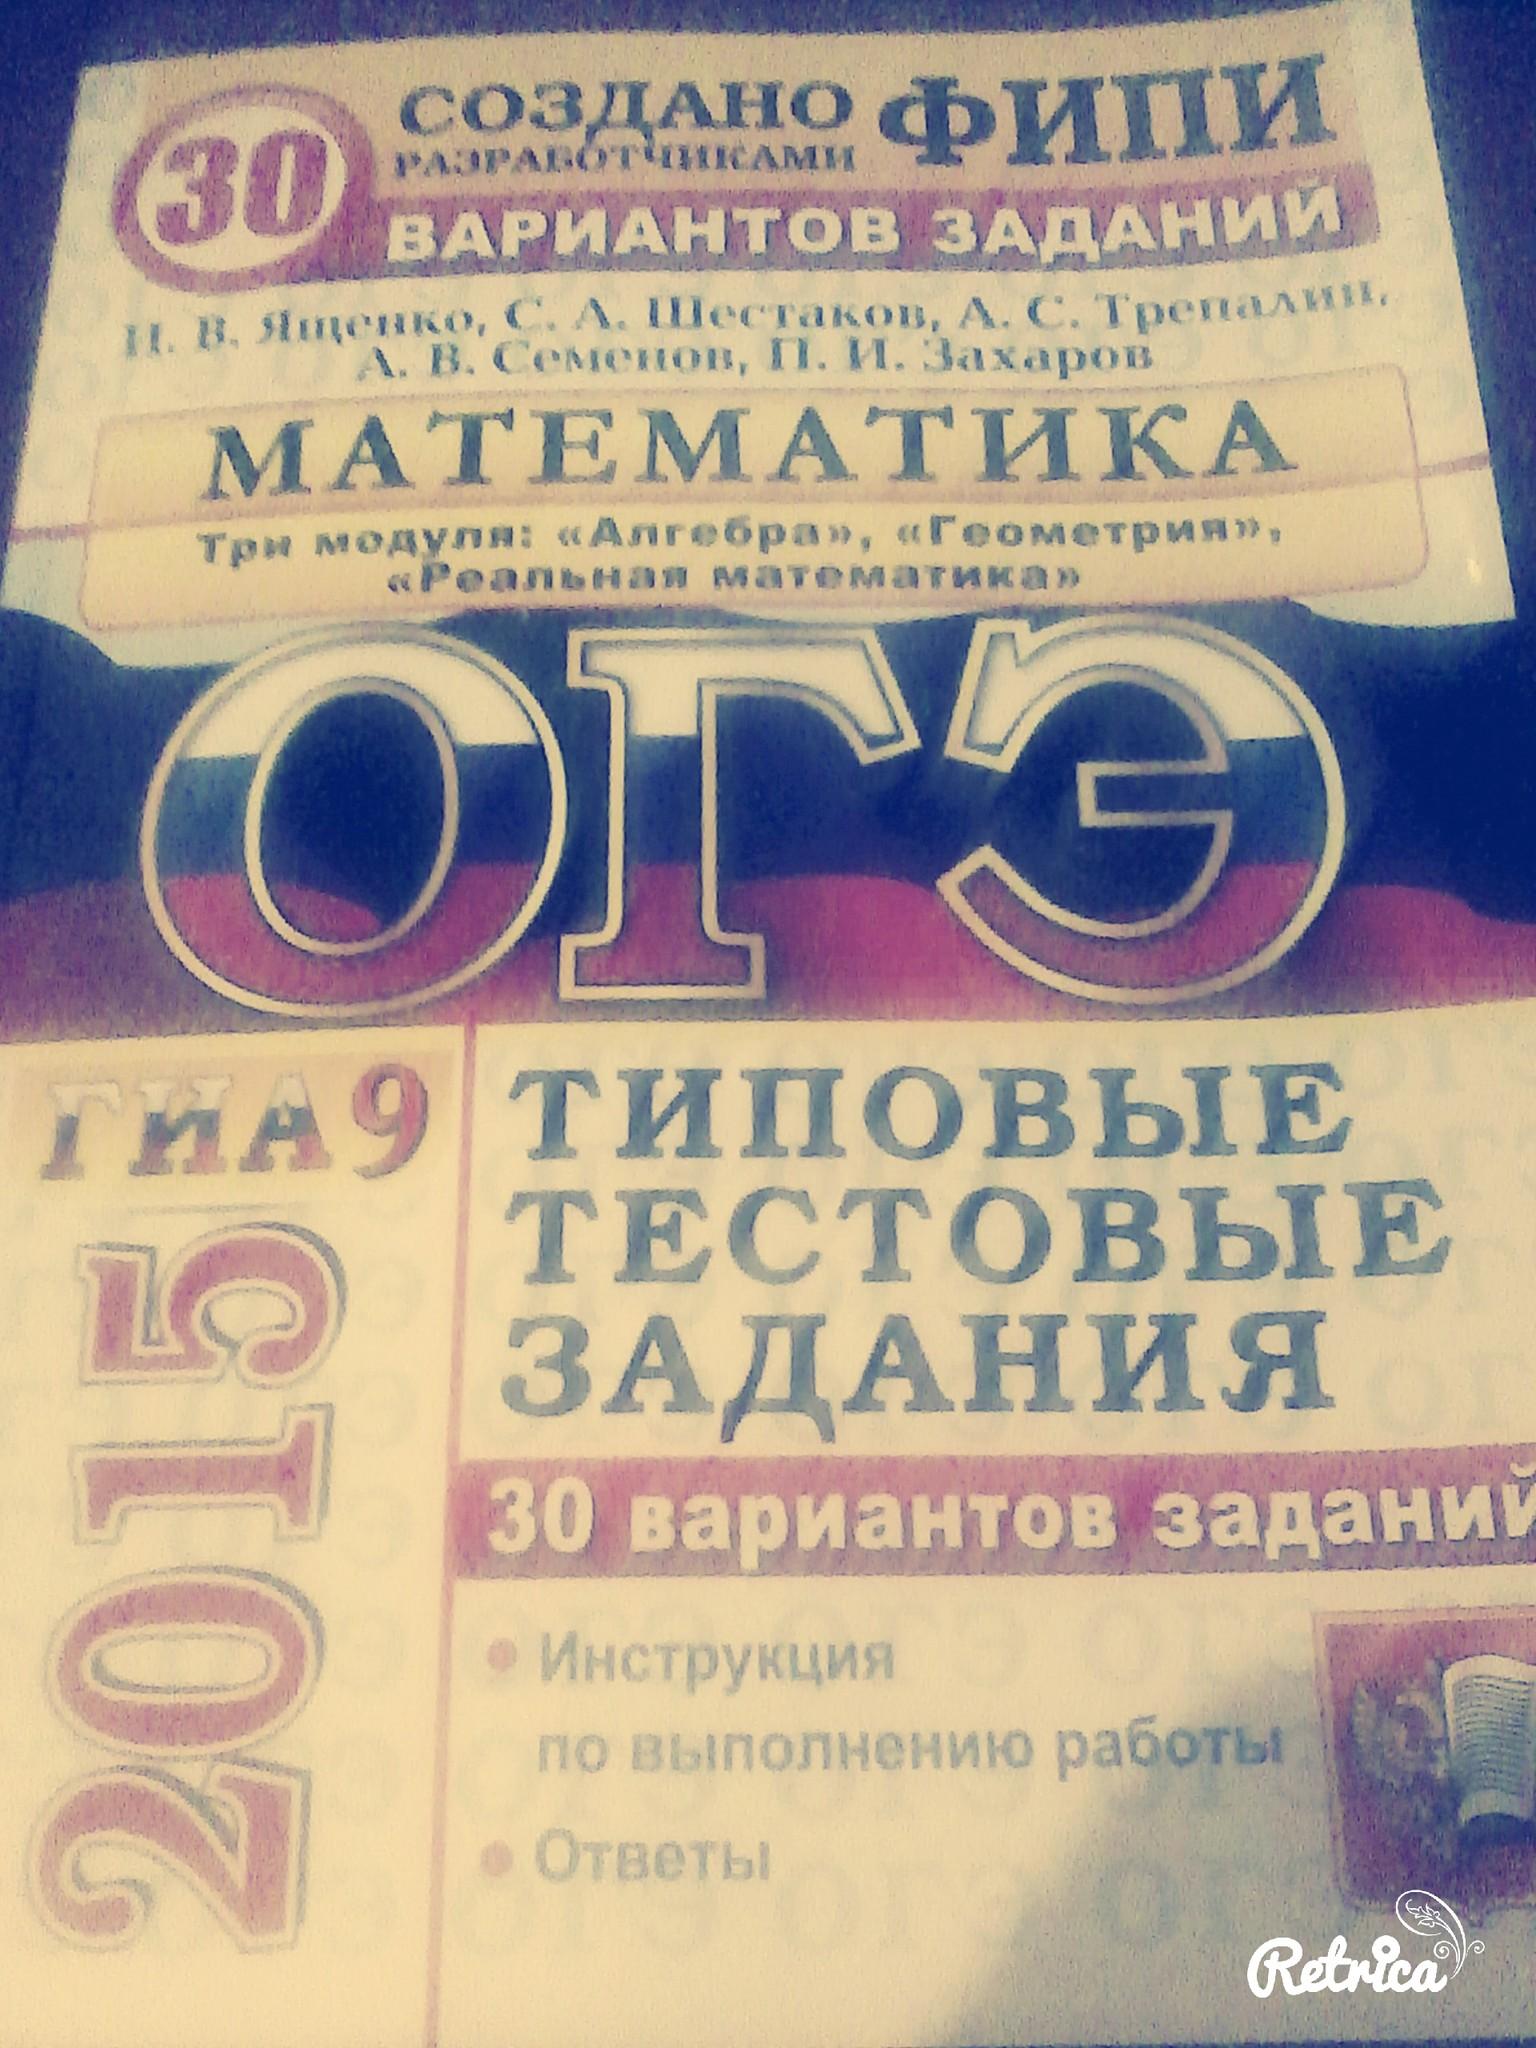 Огэ математика 2015 онлайн - c1